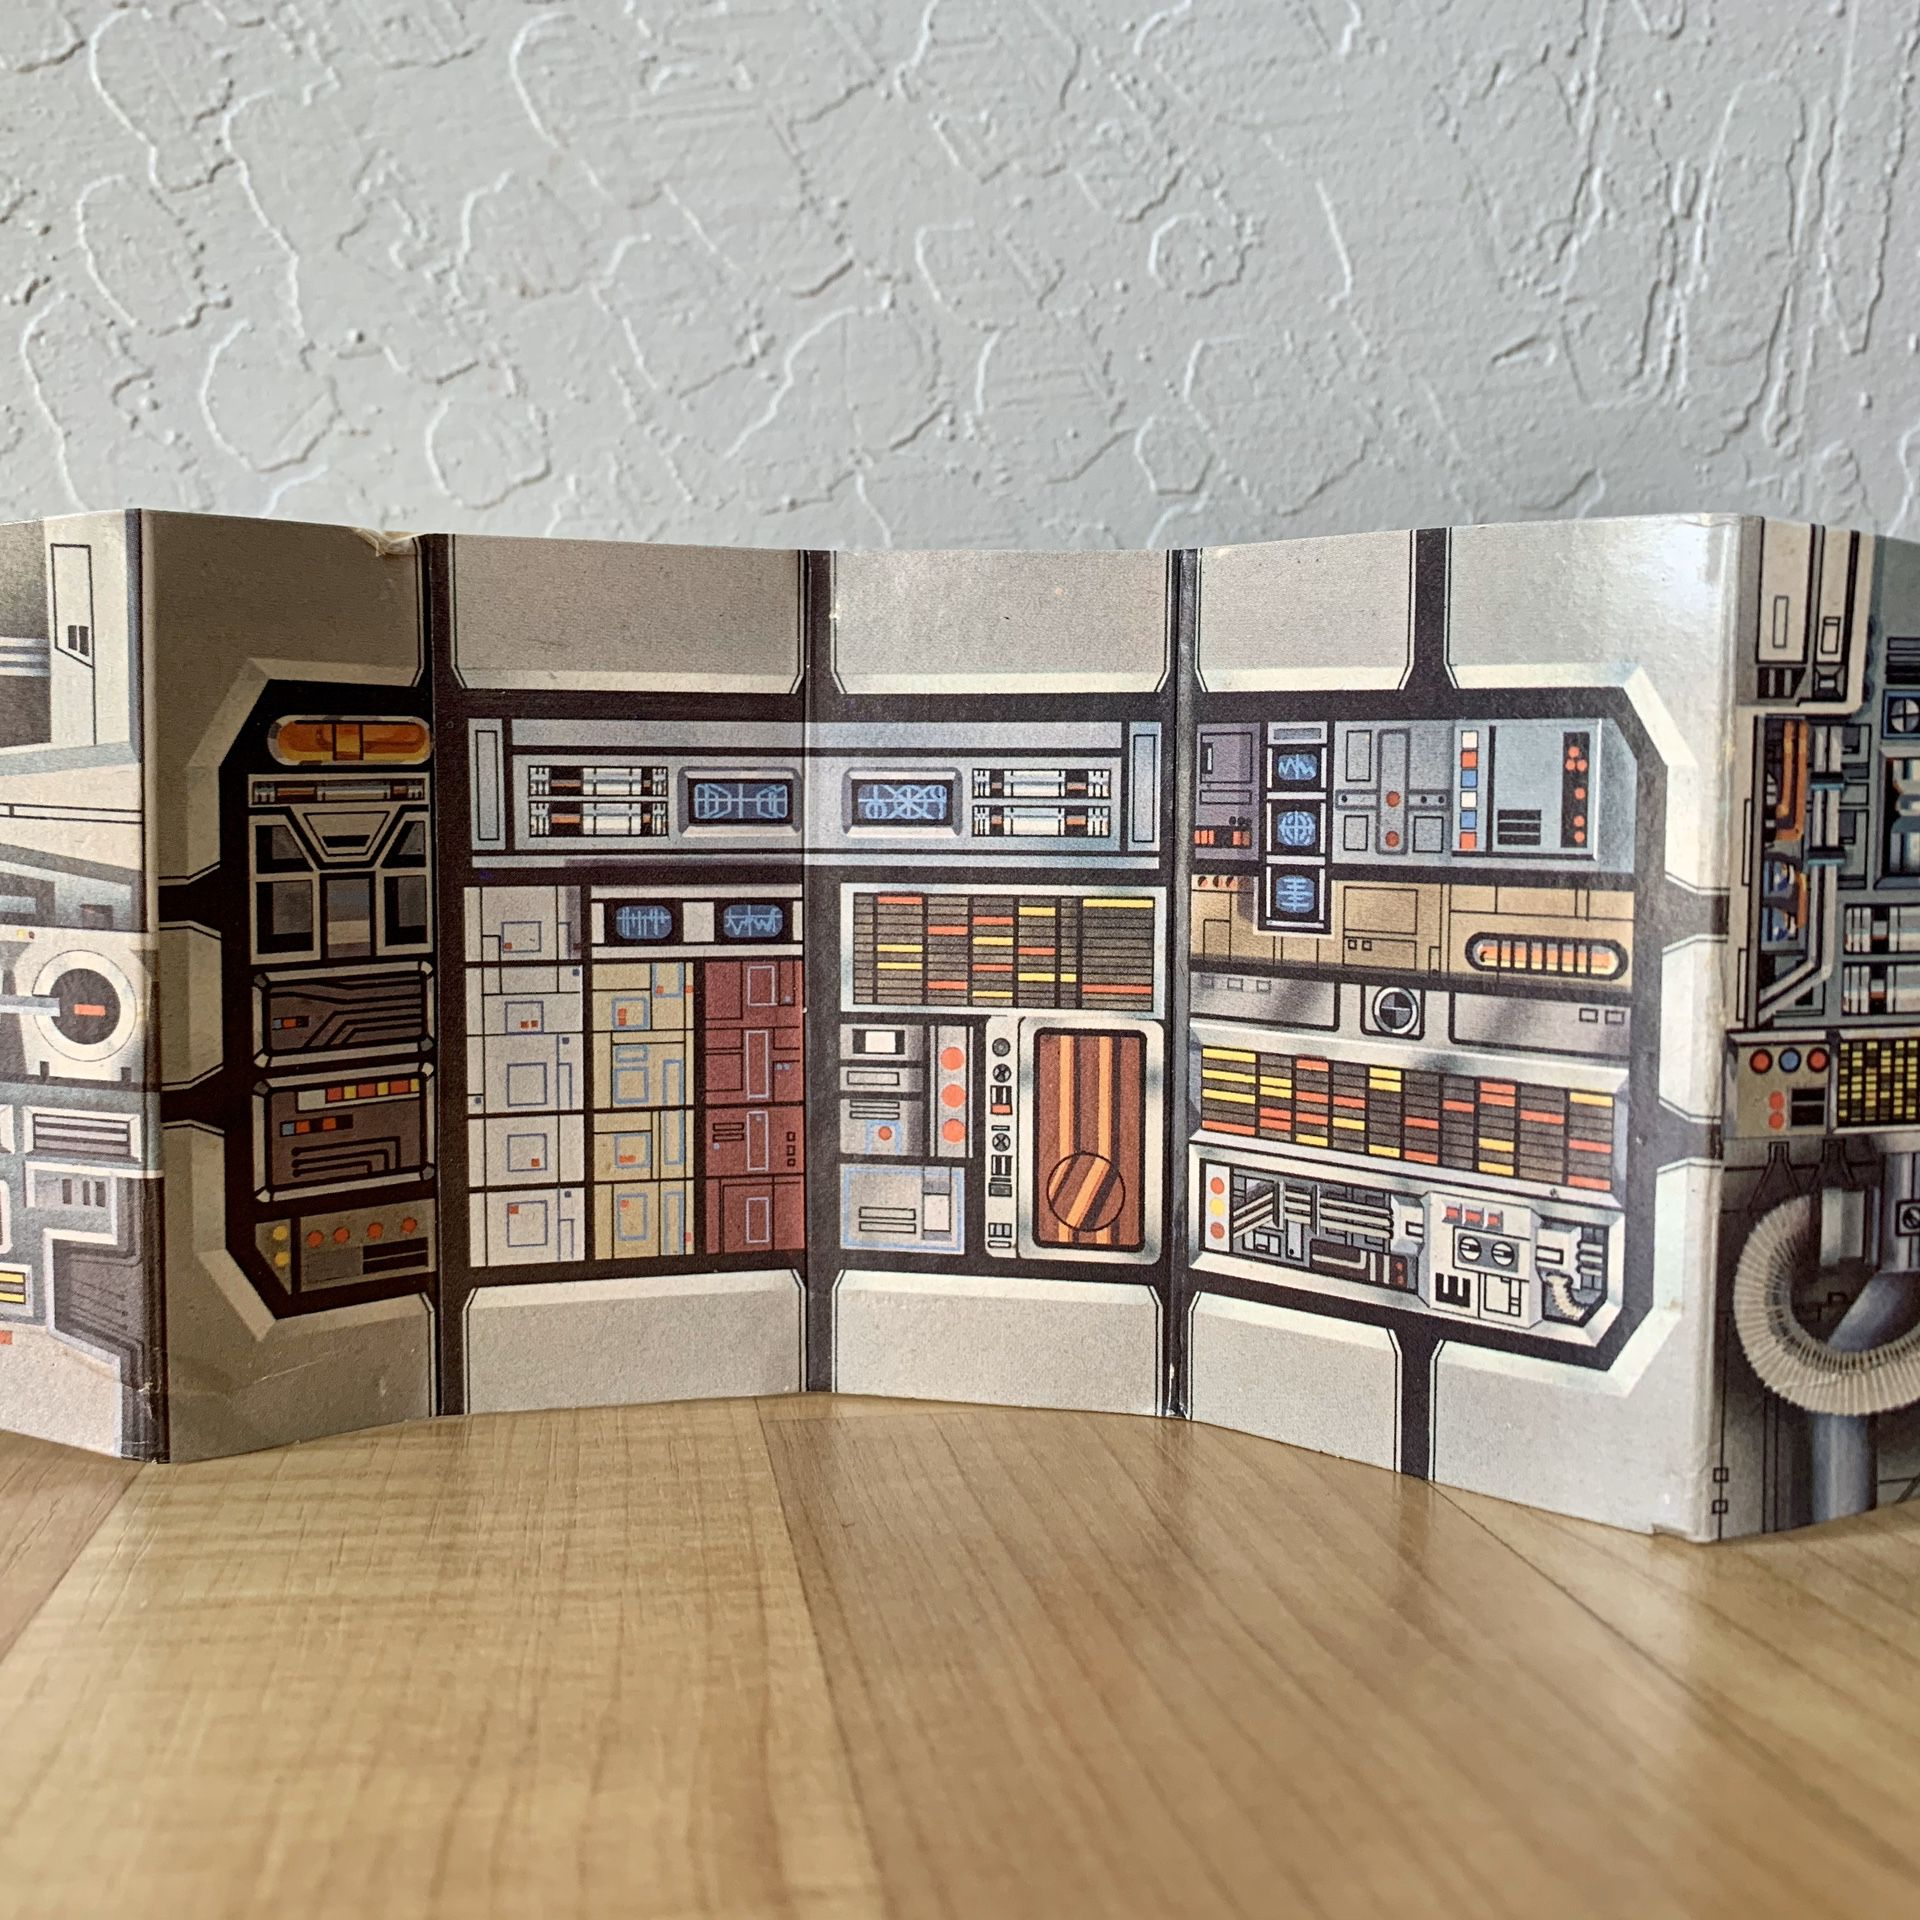 Vintage Star Wars Millennium Falcon Cargo Bay Card Board Incert